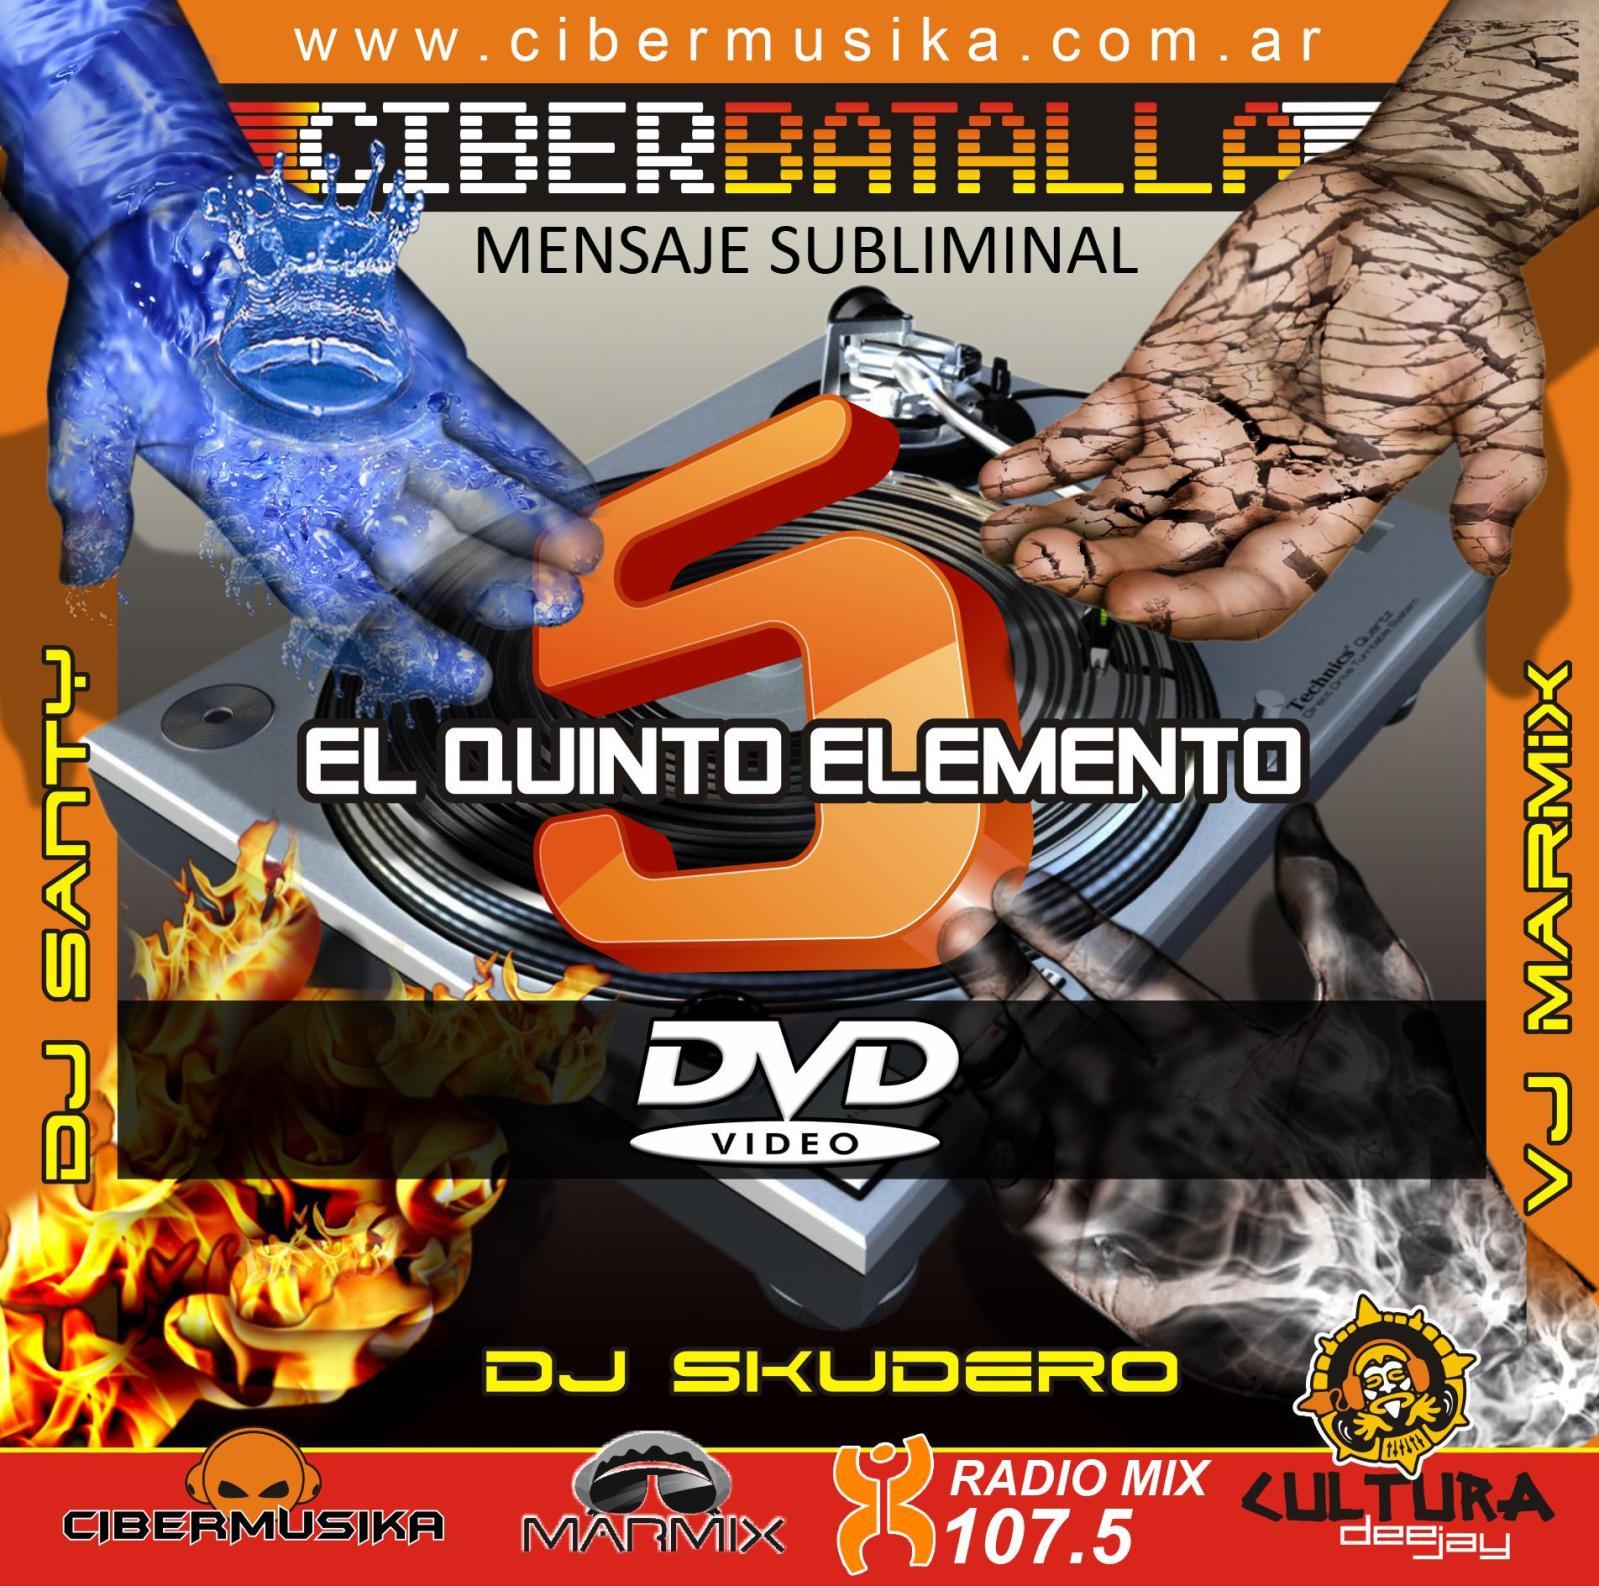 batalla cibermusika 7 dvd